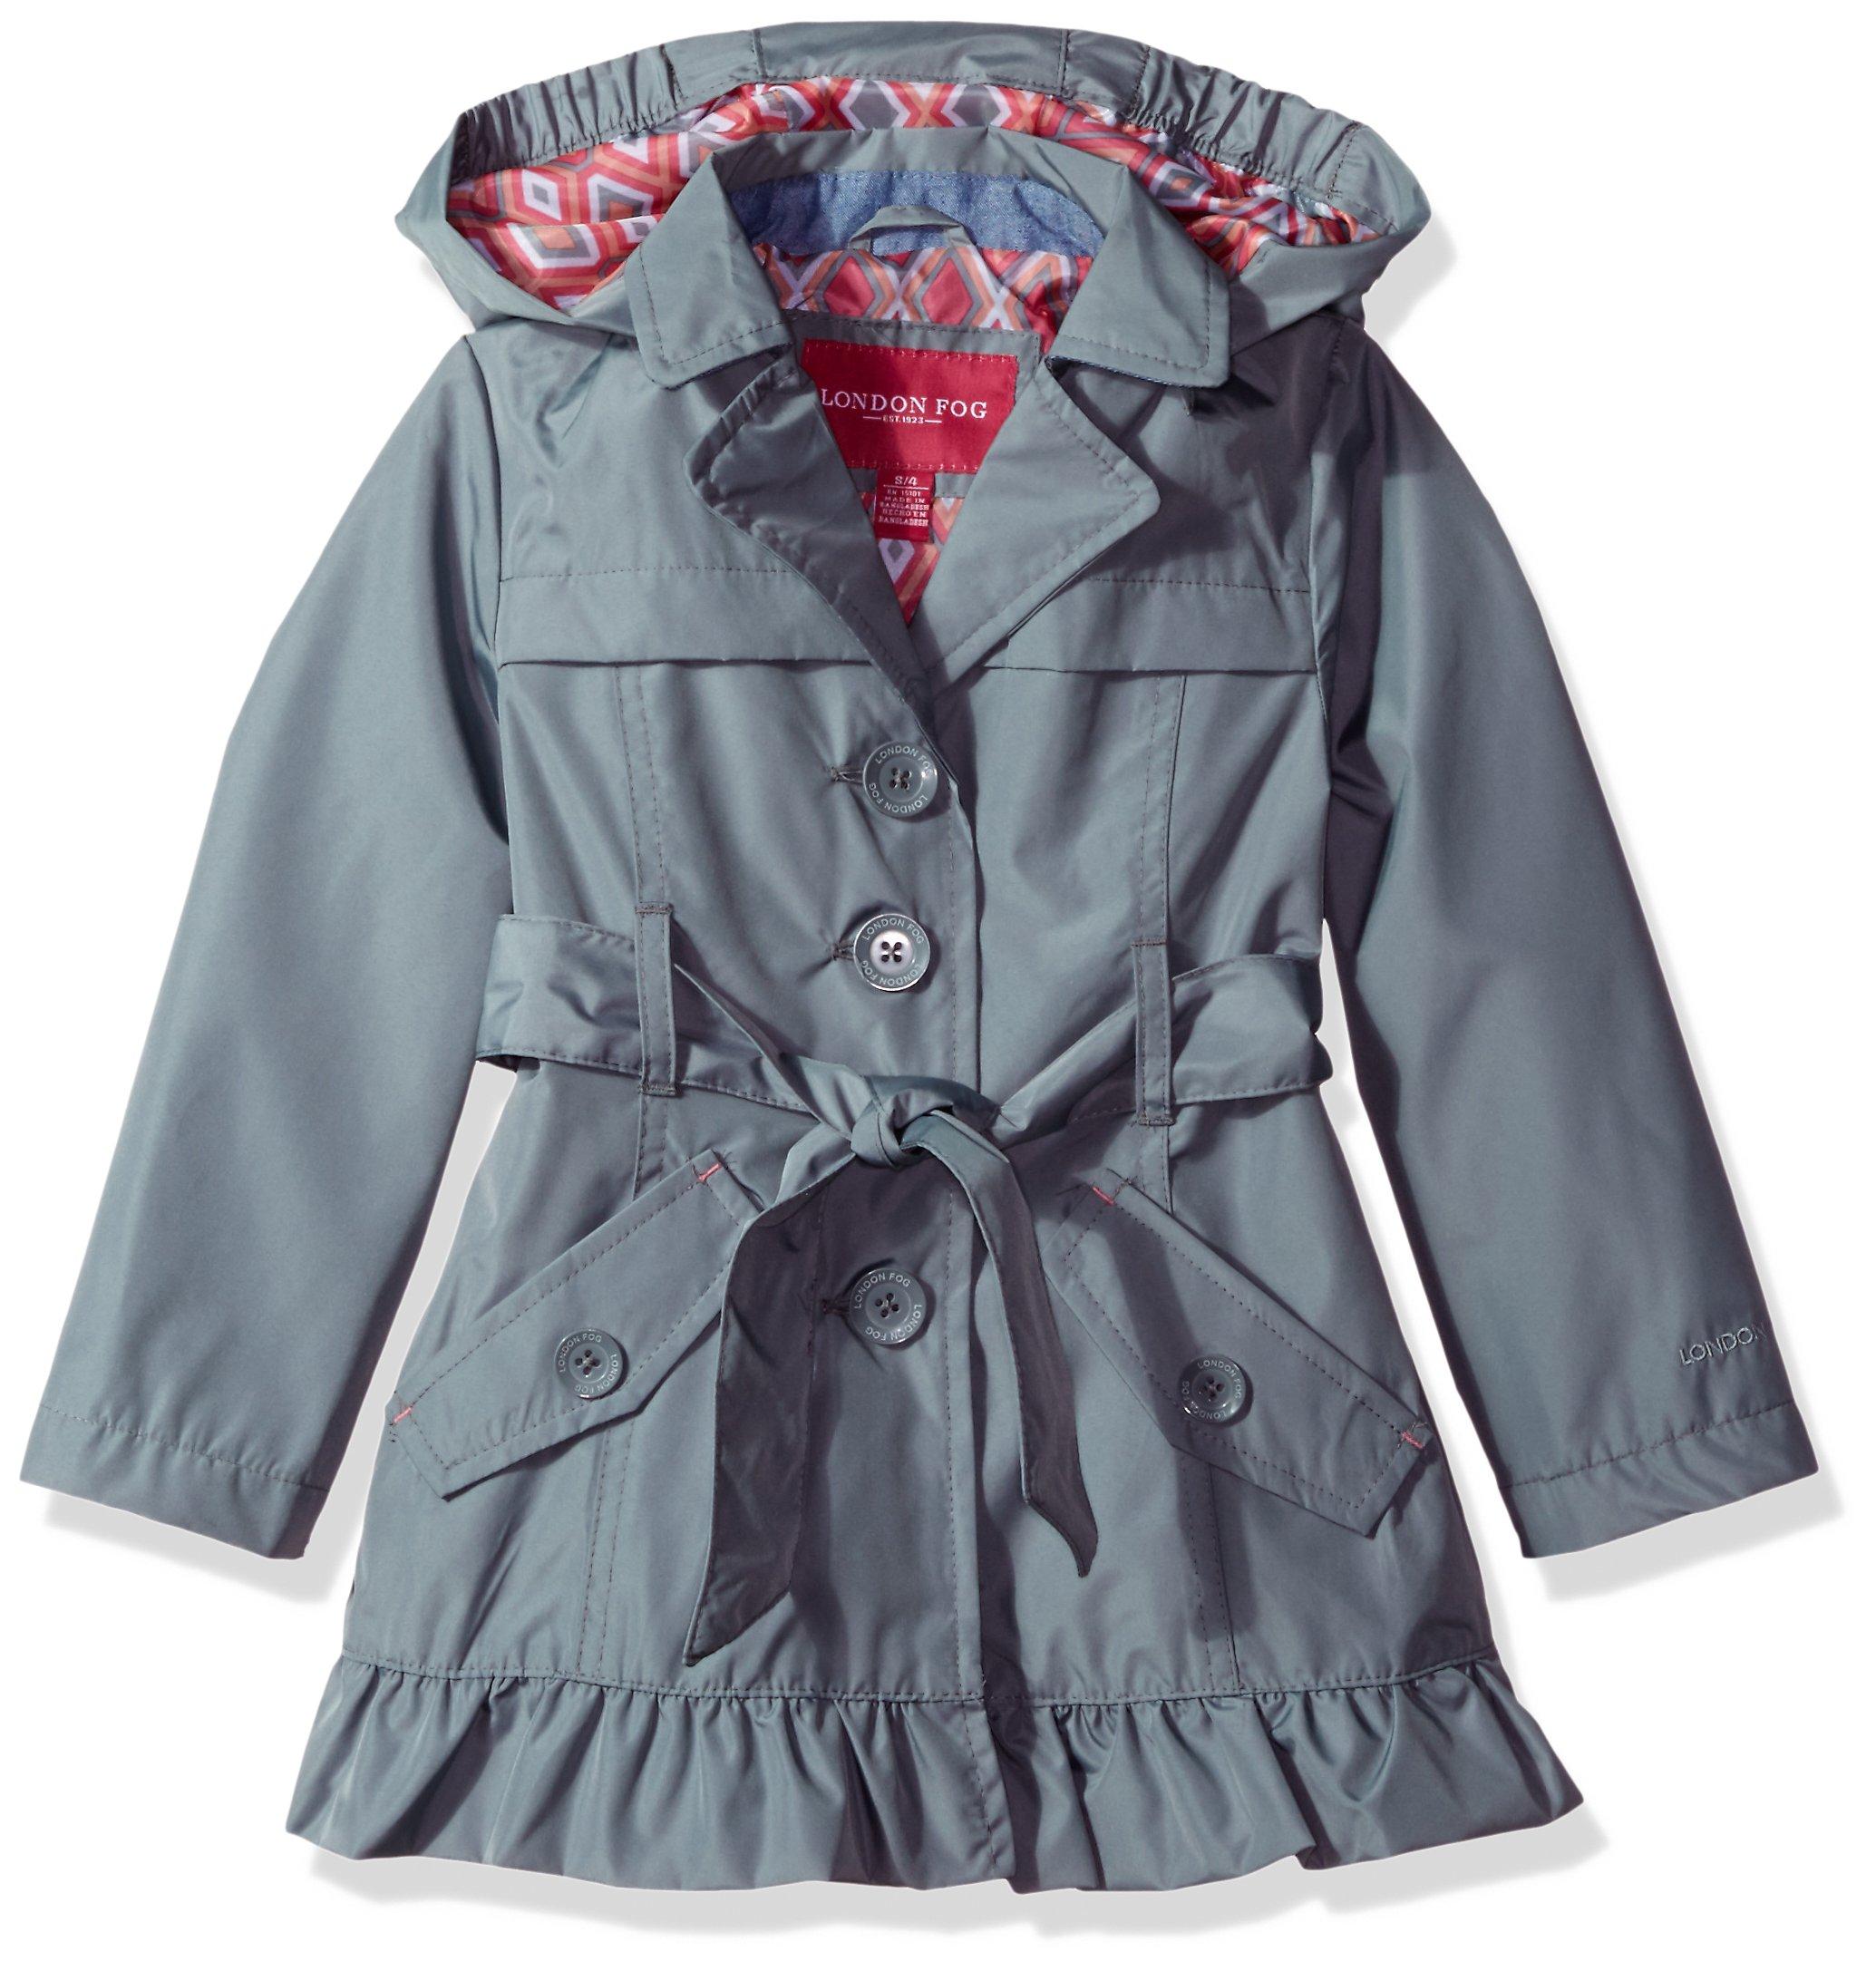 London Fog Little Girls' Single Breasted Trench Coat, Summer Grey, 4